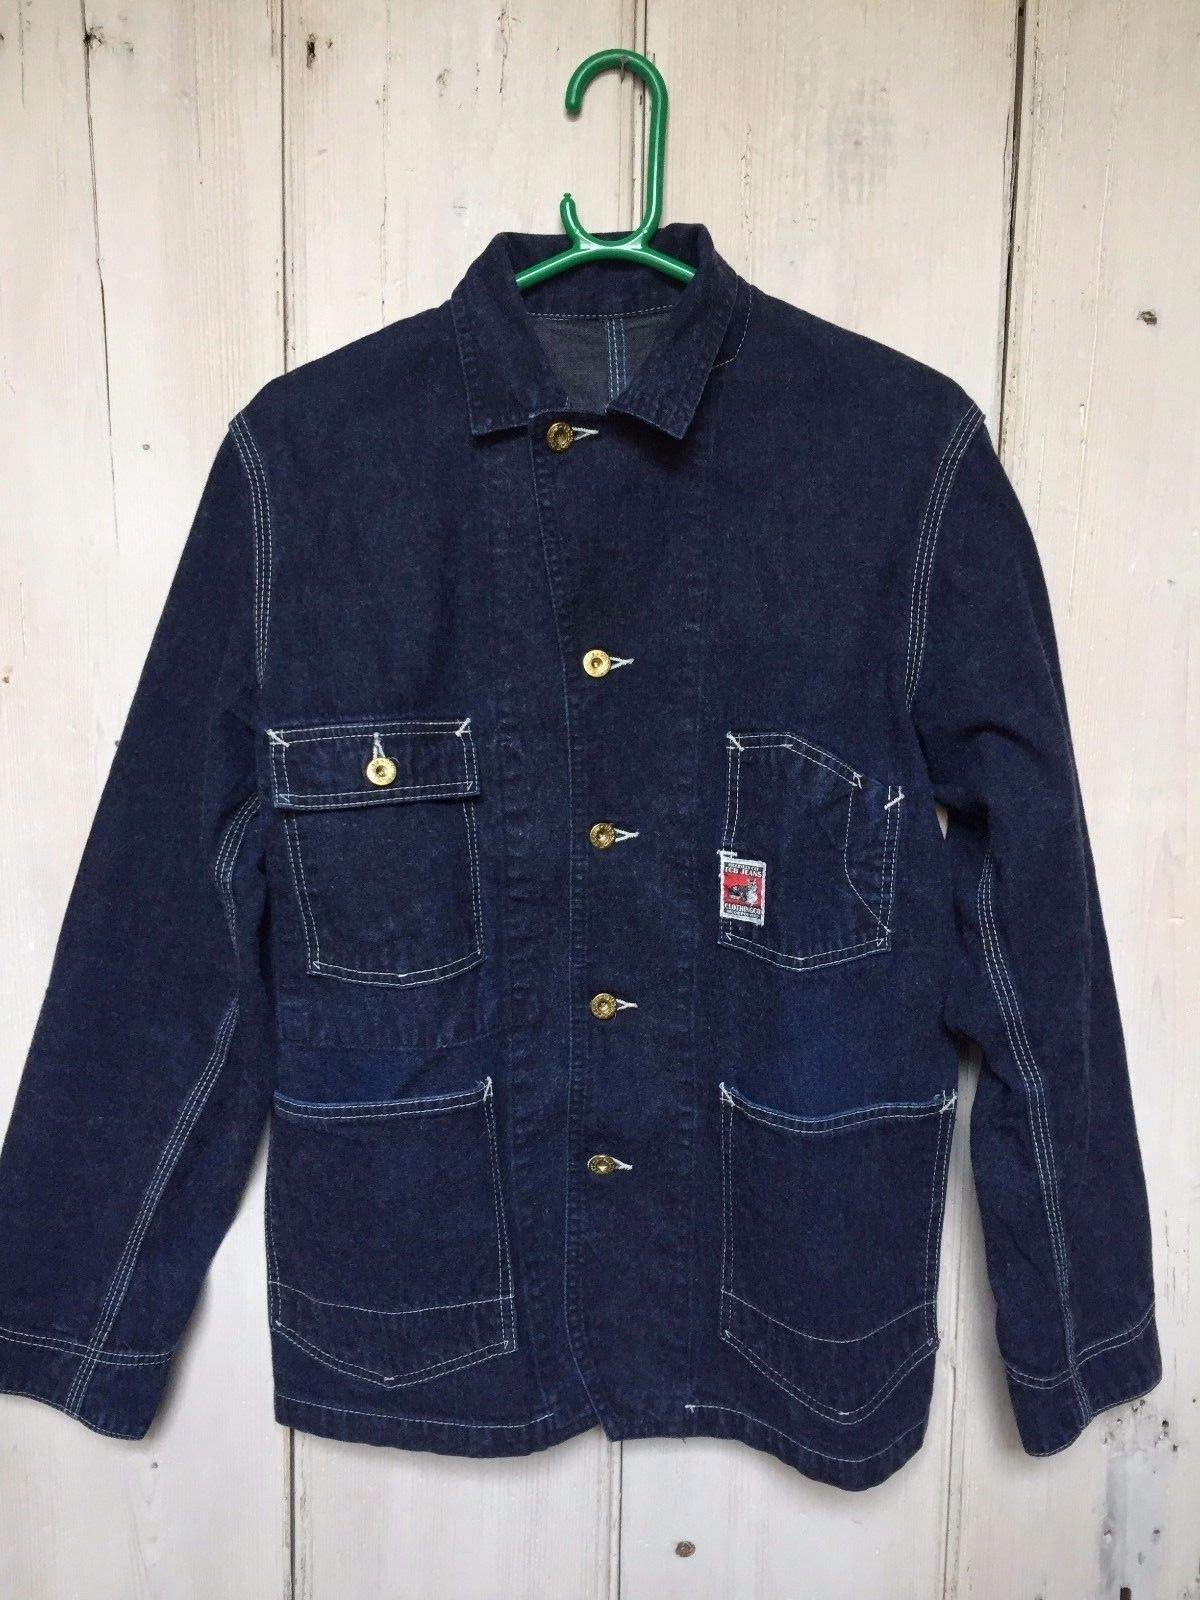 TCB Denim chore jacket. M- SOLD. pls delete